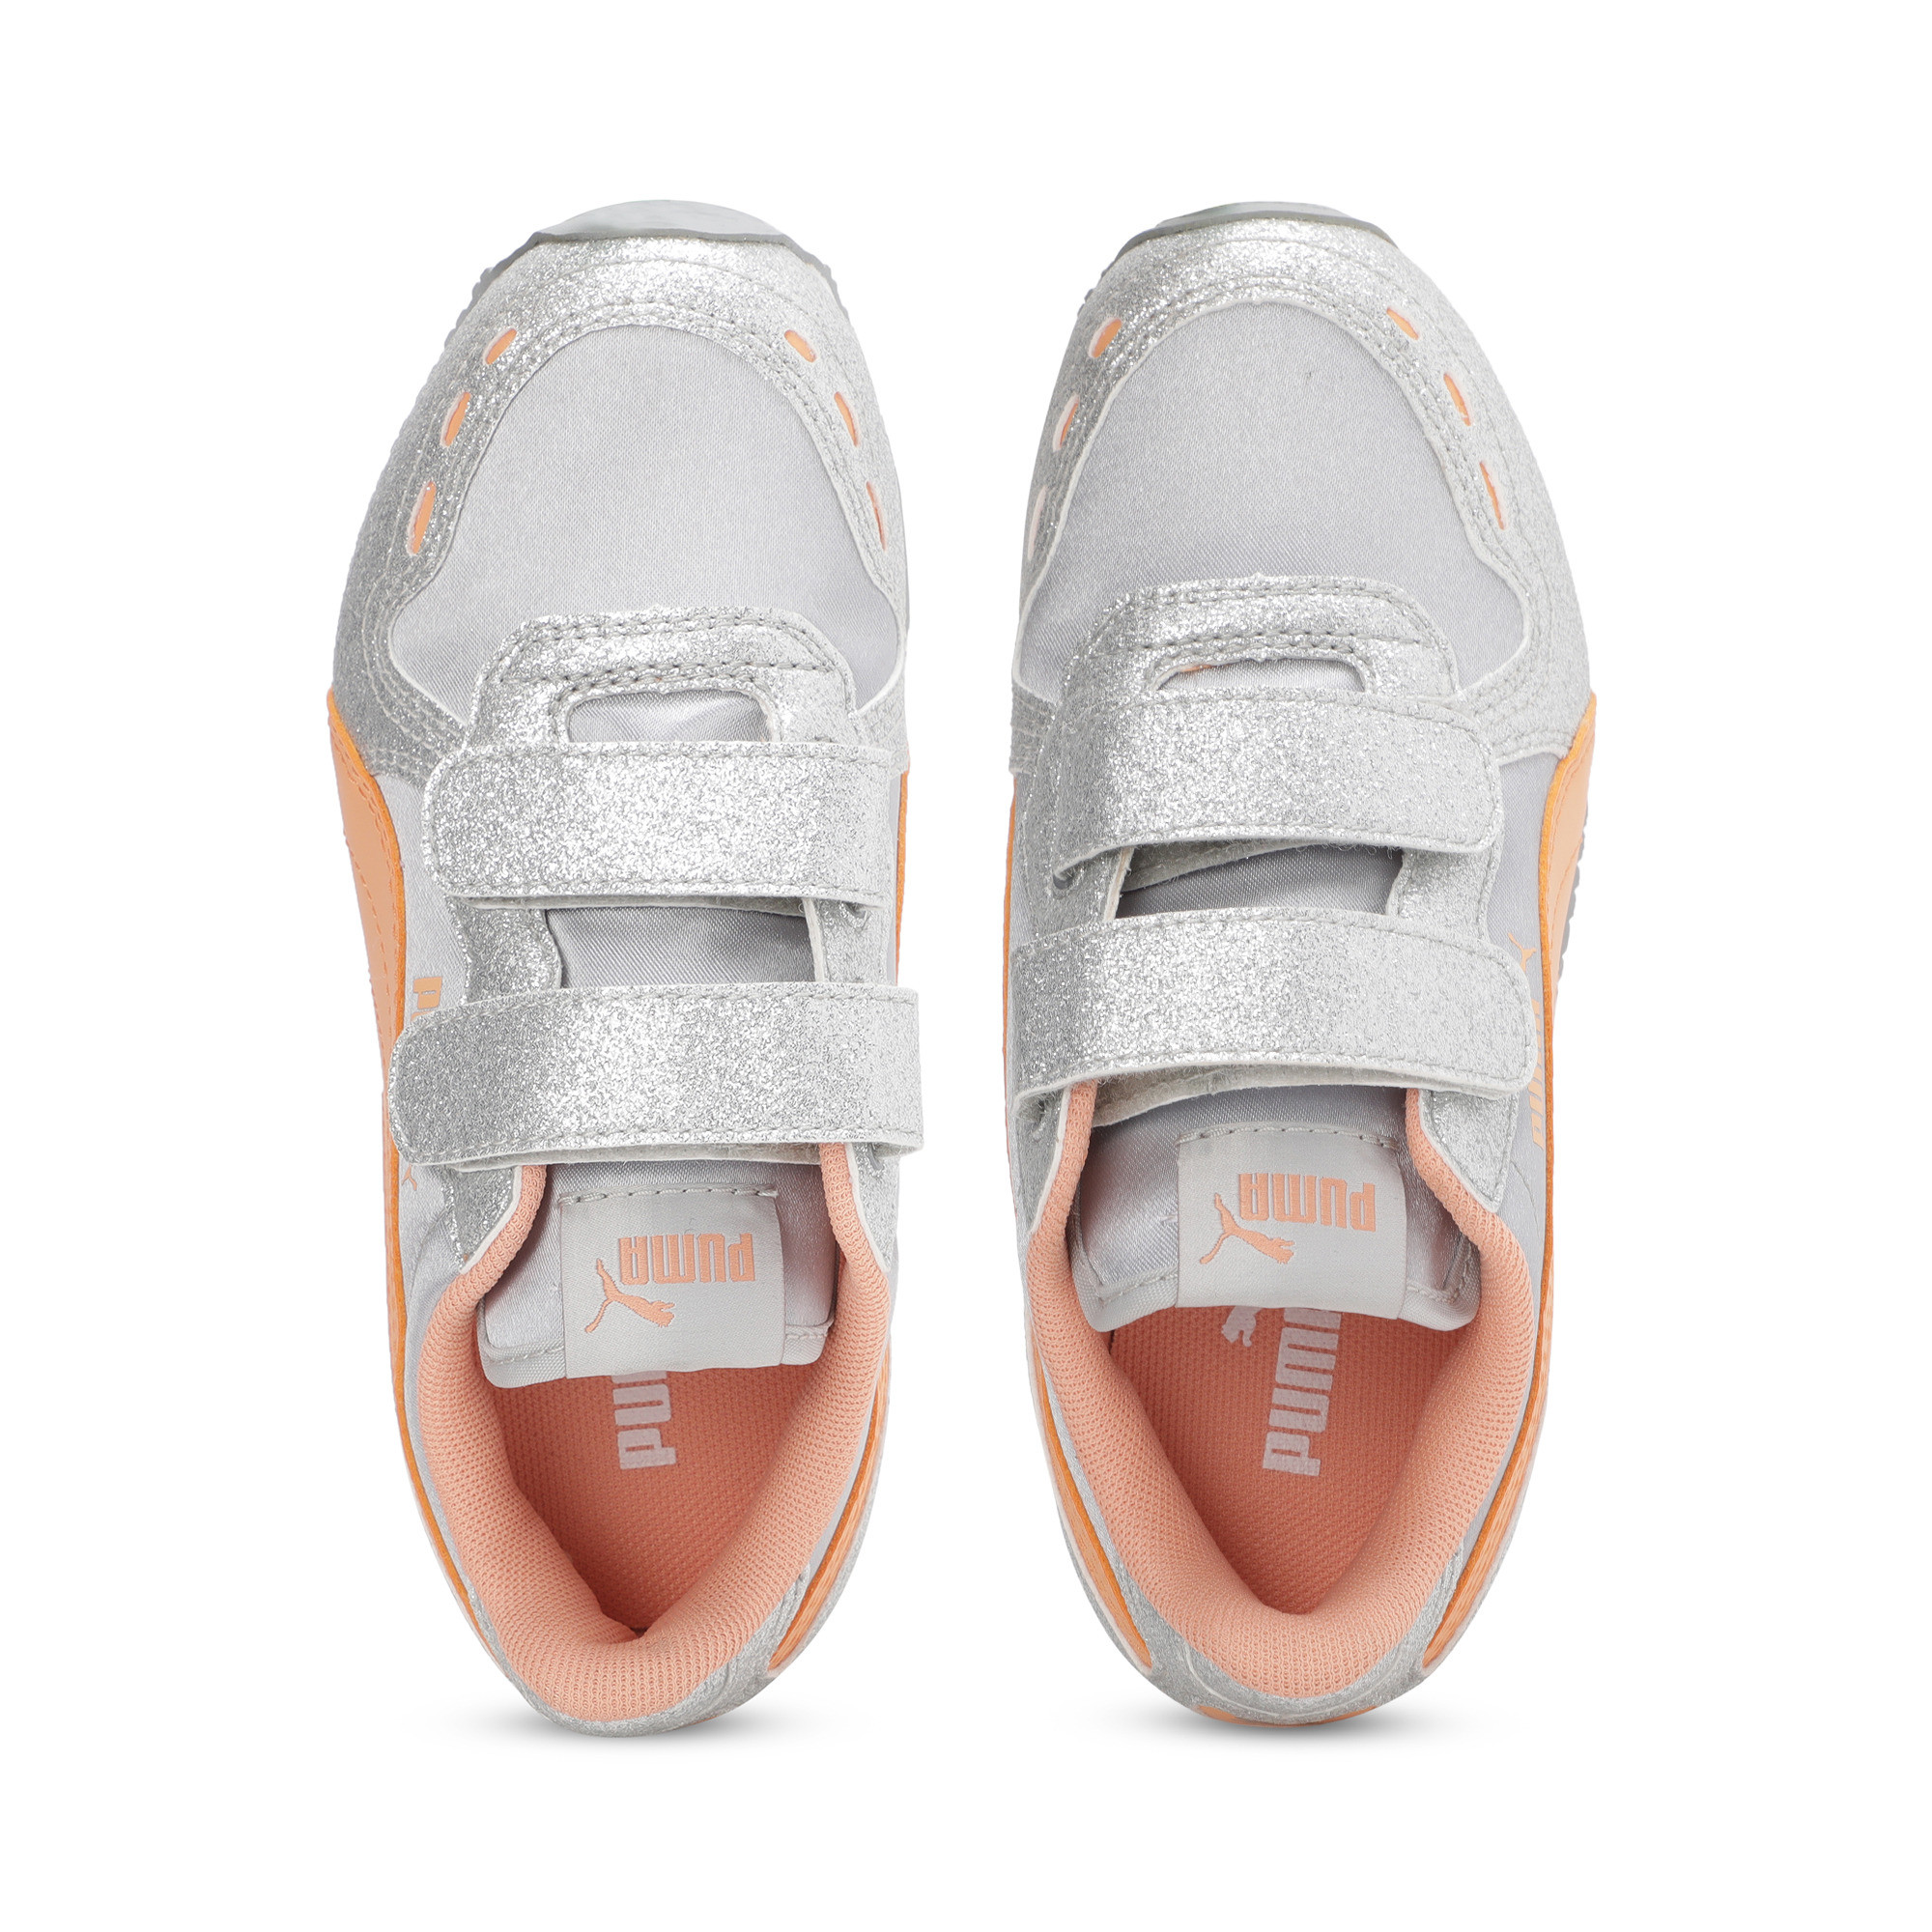 PUMA-Pre-School-Girl-039-s-Cabana-Racer-Glitz-AC-Shoes thumbnail 25